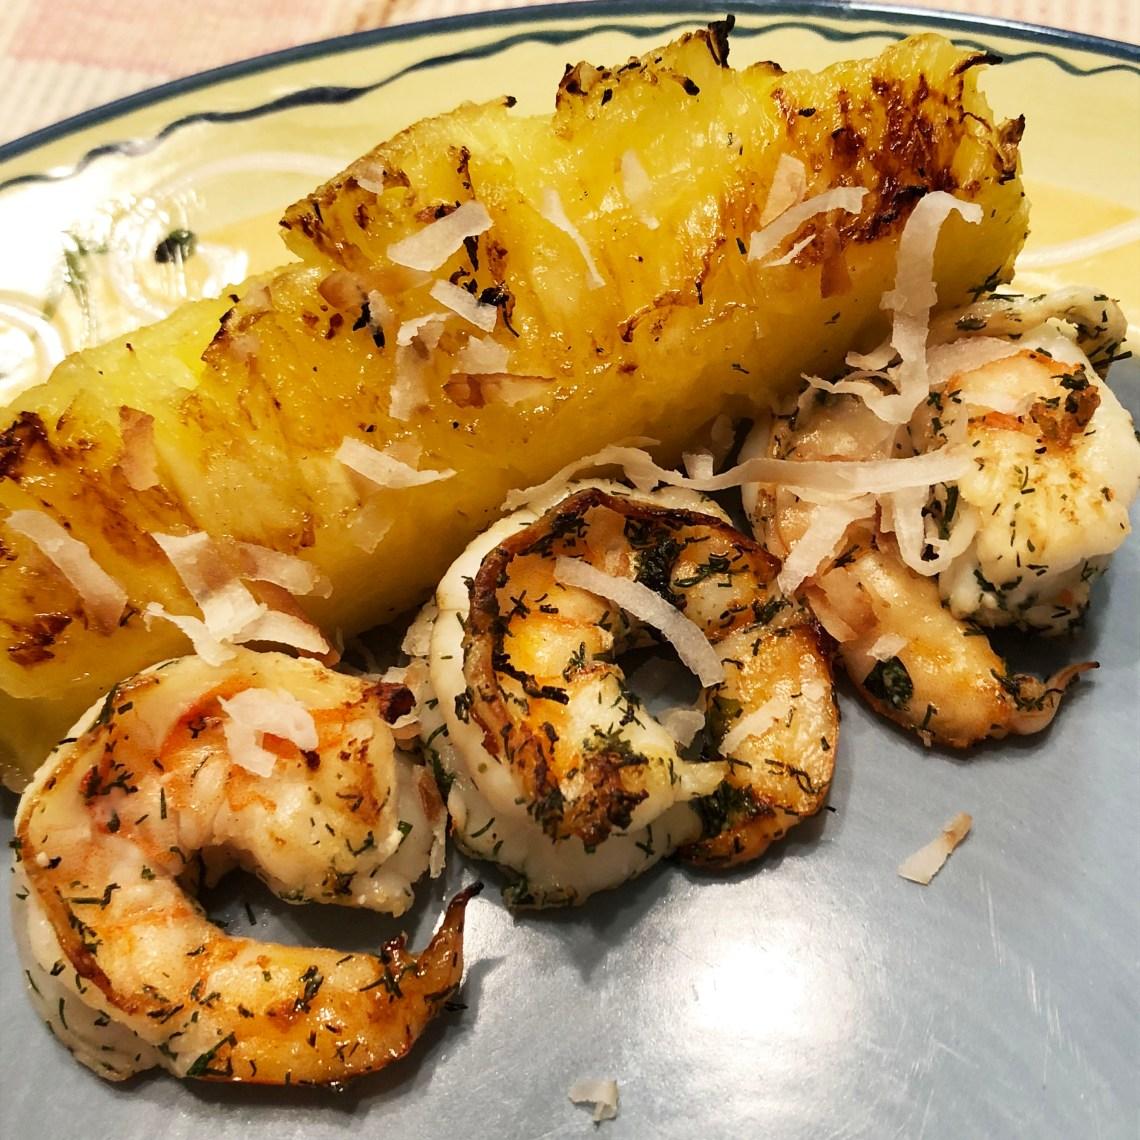 Grilled Shrimp & Pineapple